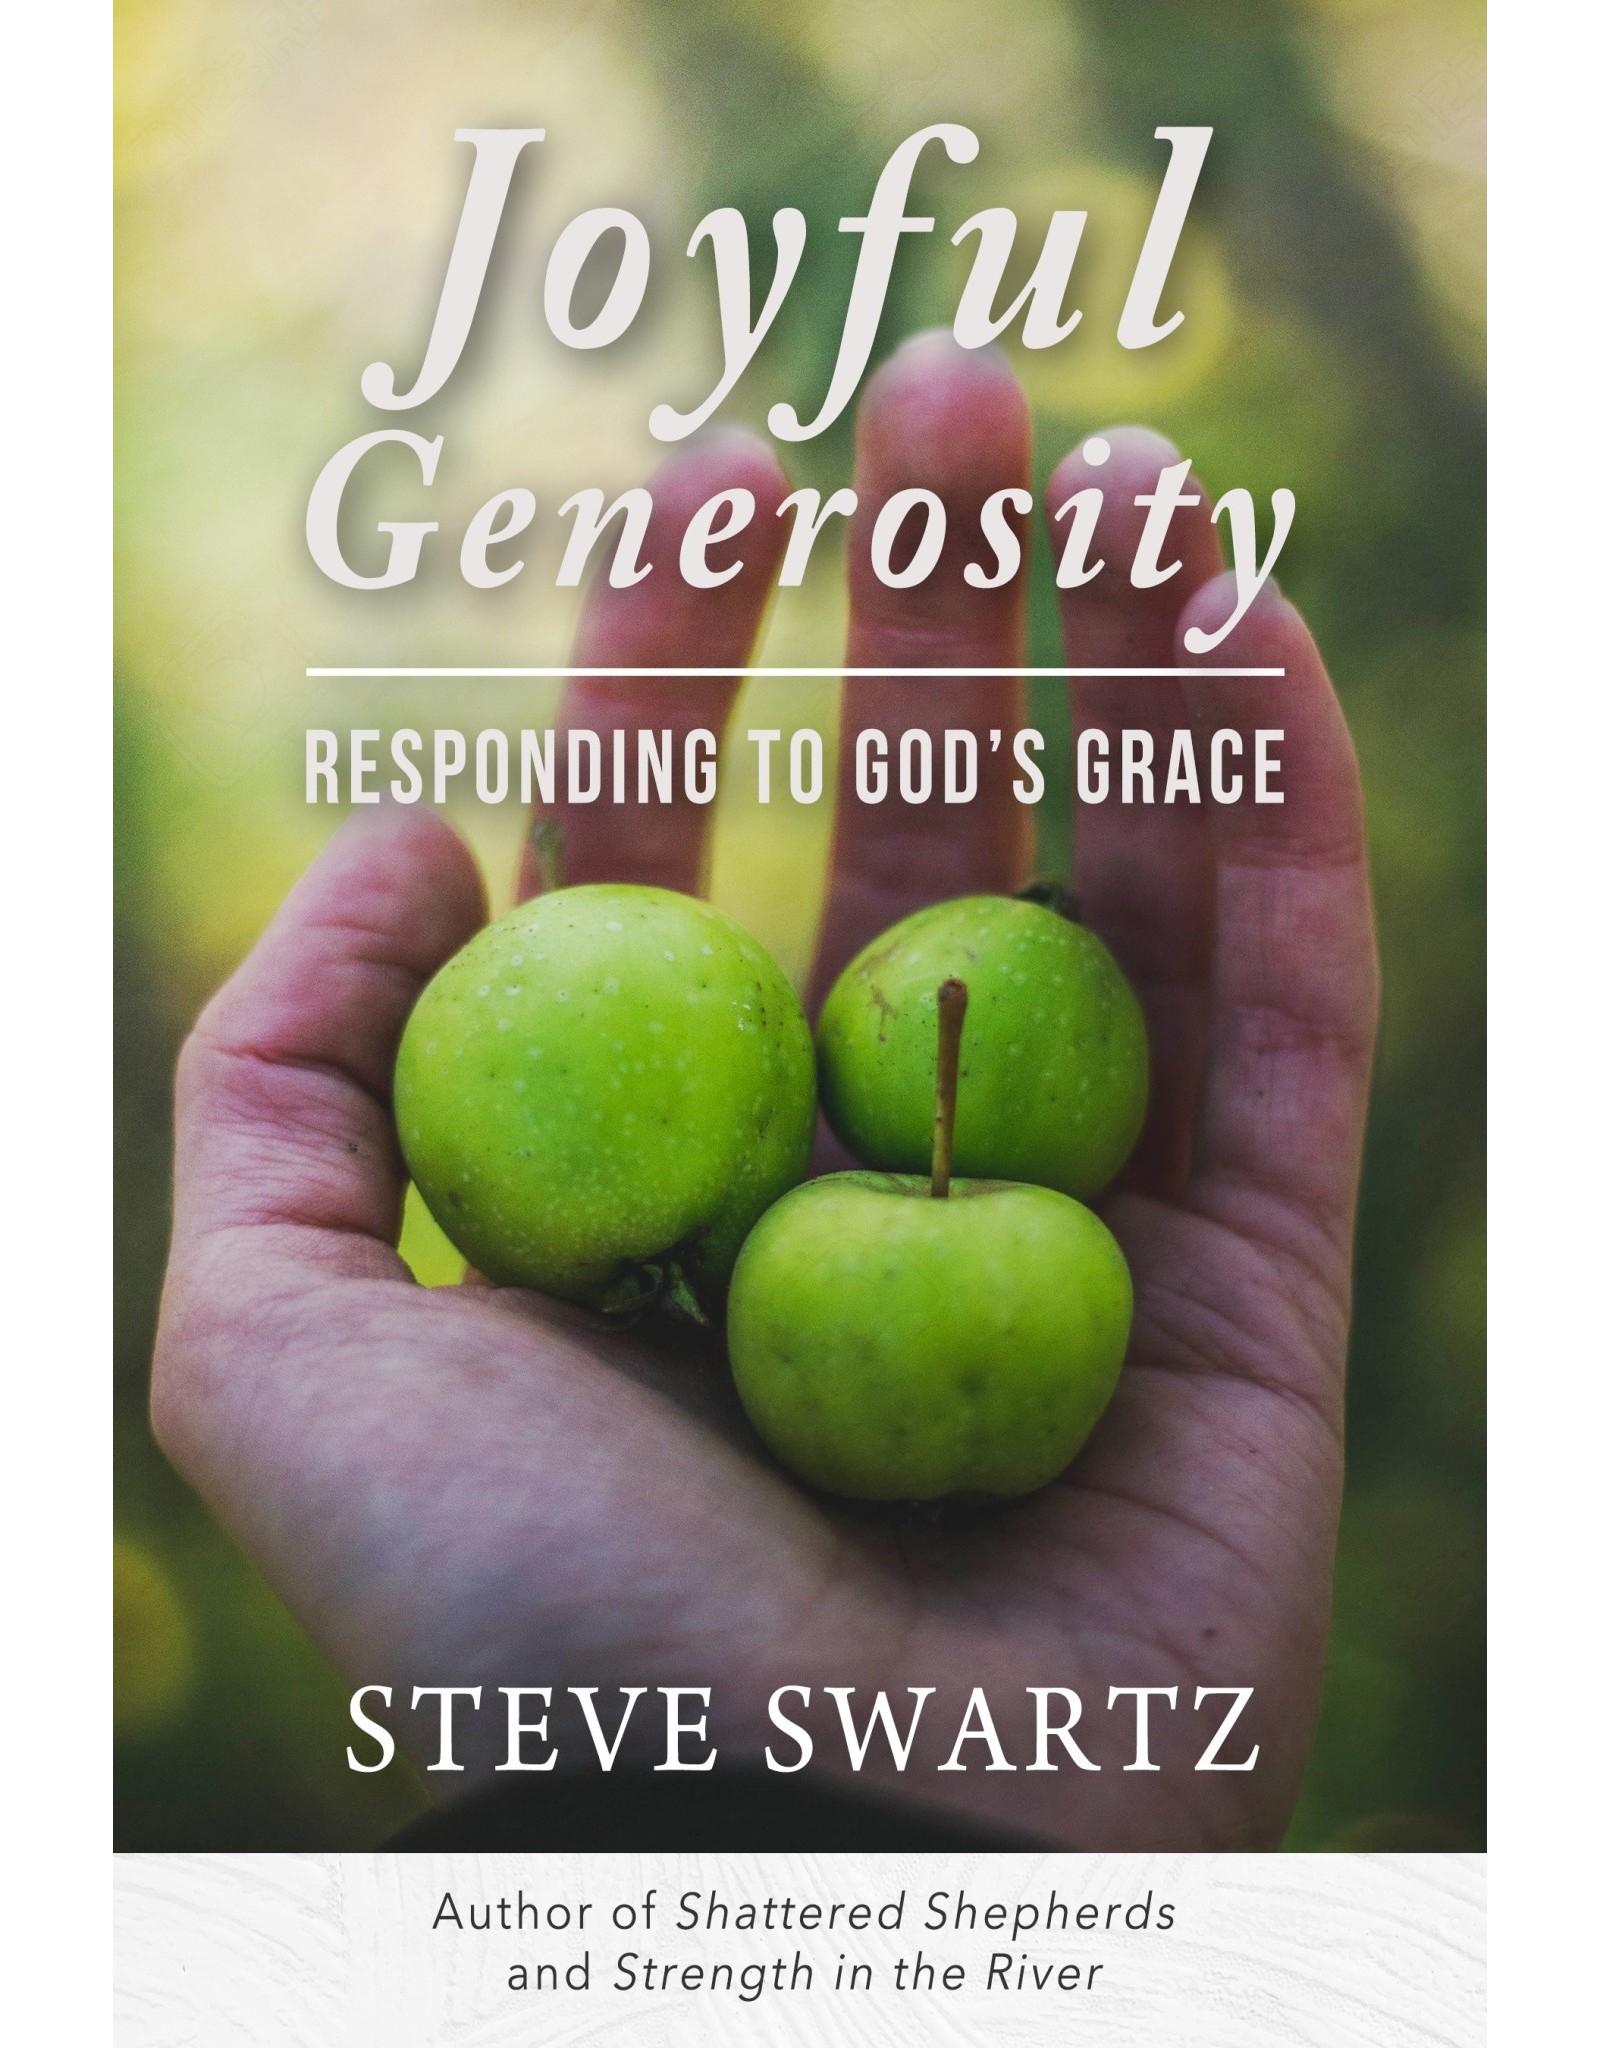 Kress Joyful Generosity: Responding to God's Grace